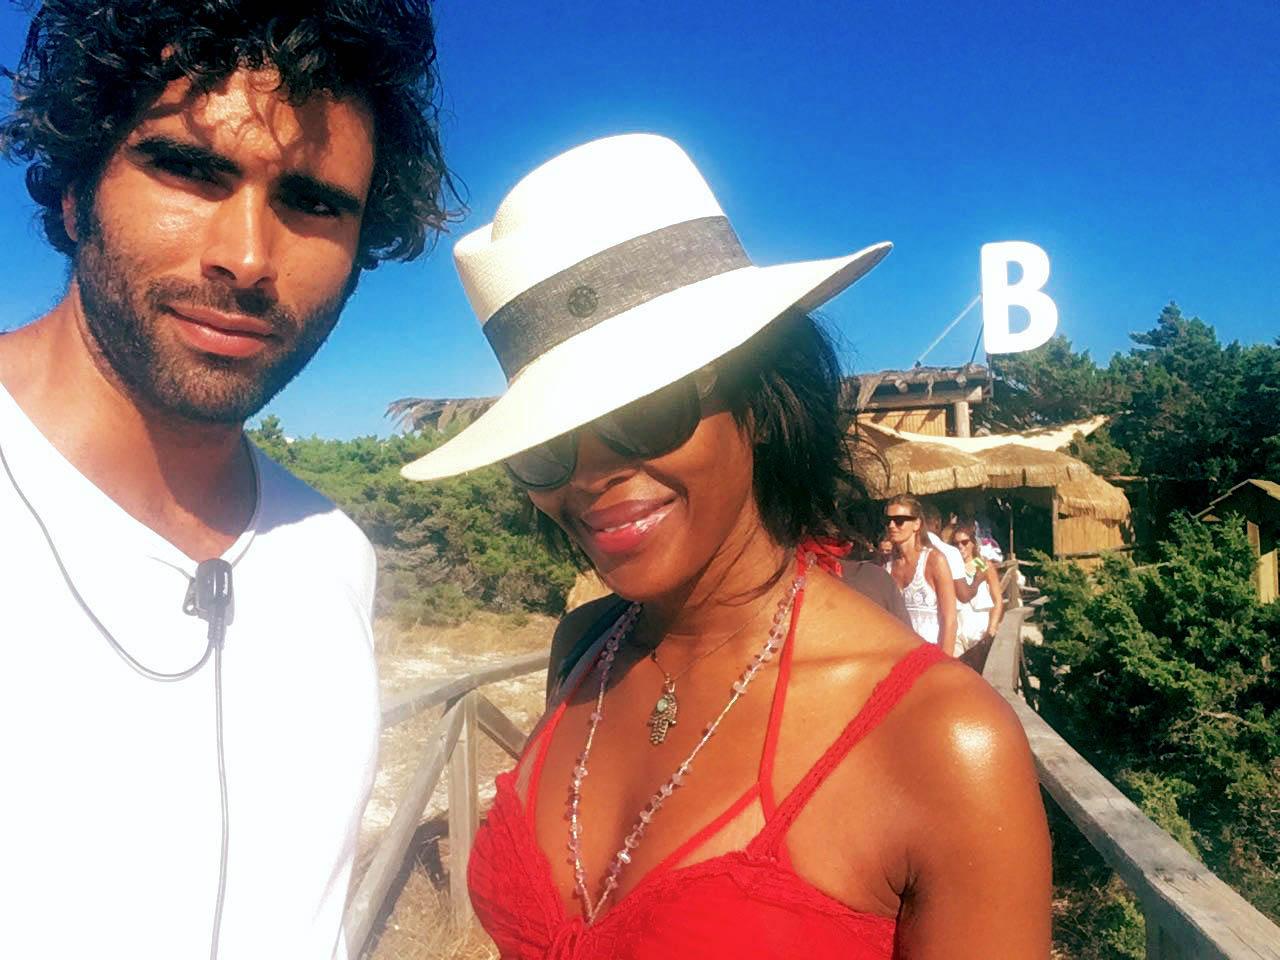 Naomi Campbell Saulo Costa Summer 2017 Beso Beach copia.jpeg